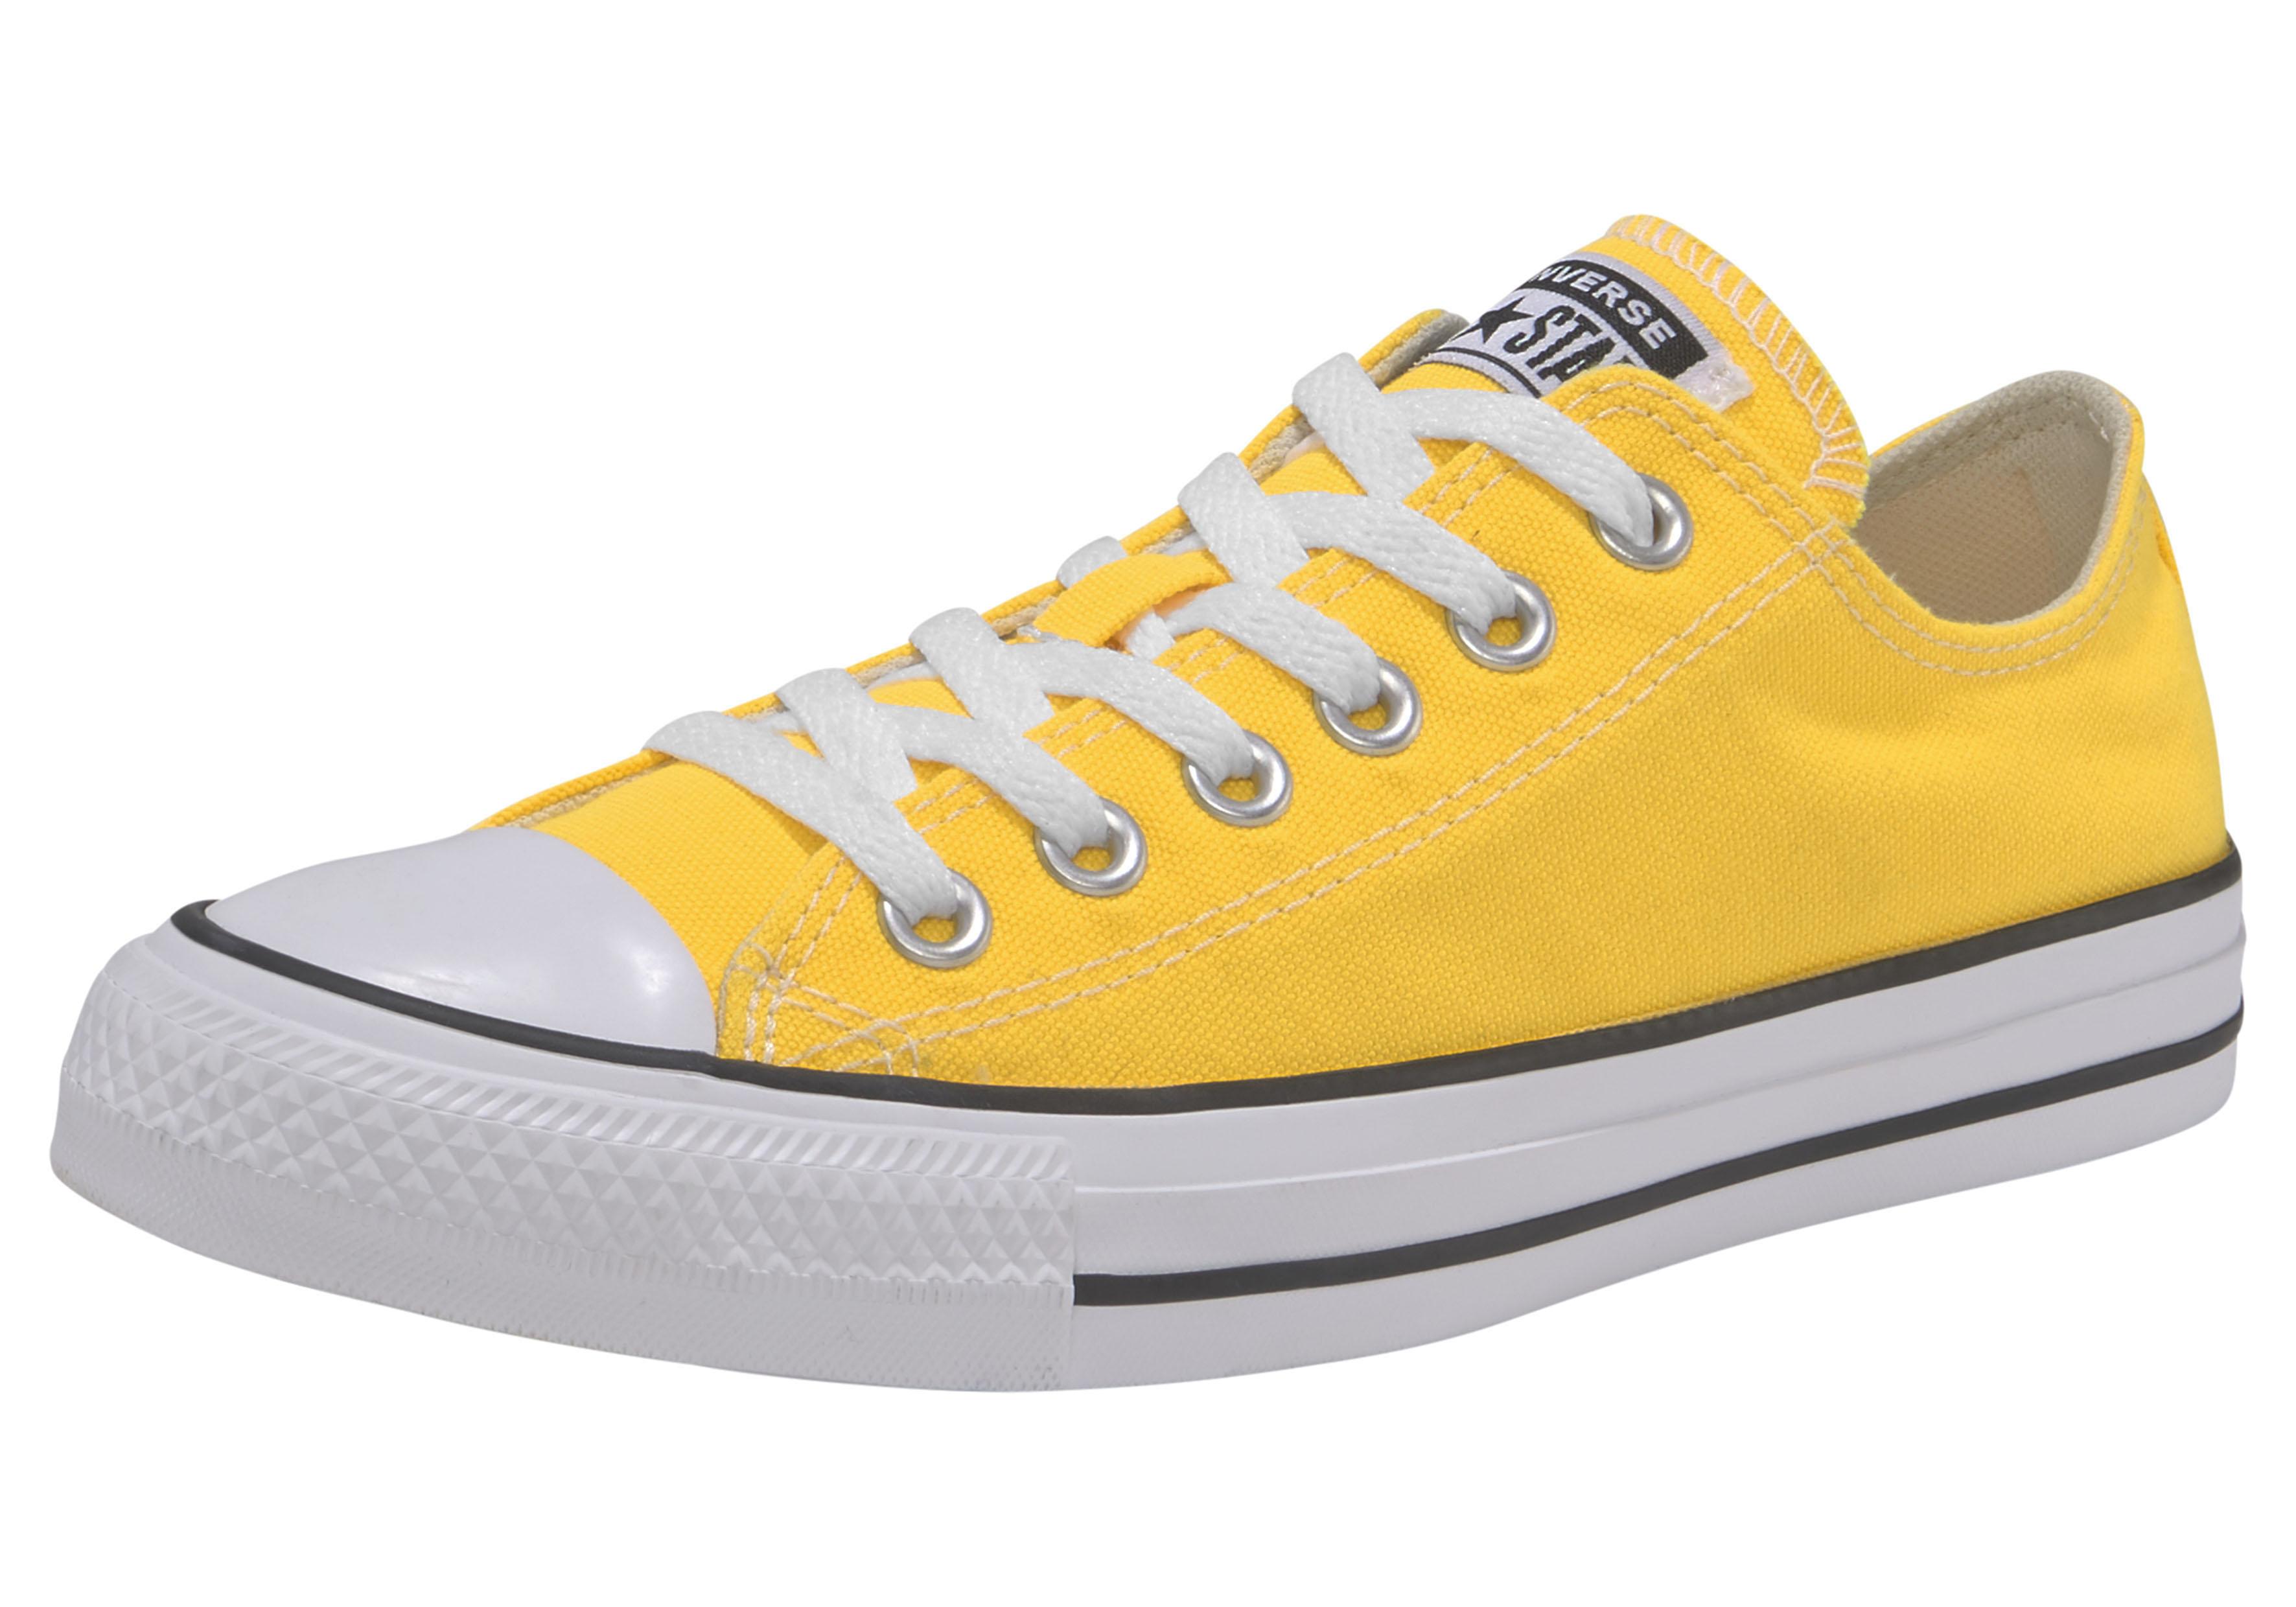 Converse Sneaker Chuck Taylor All Star Ox Seasonal